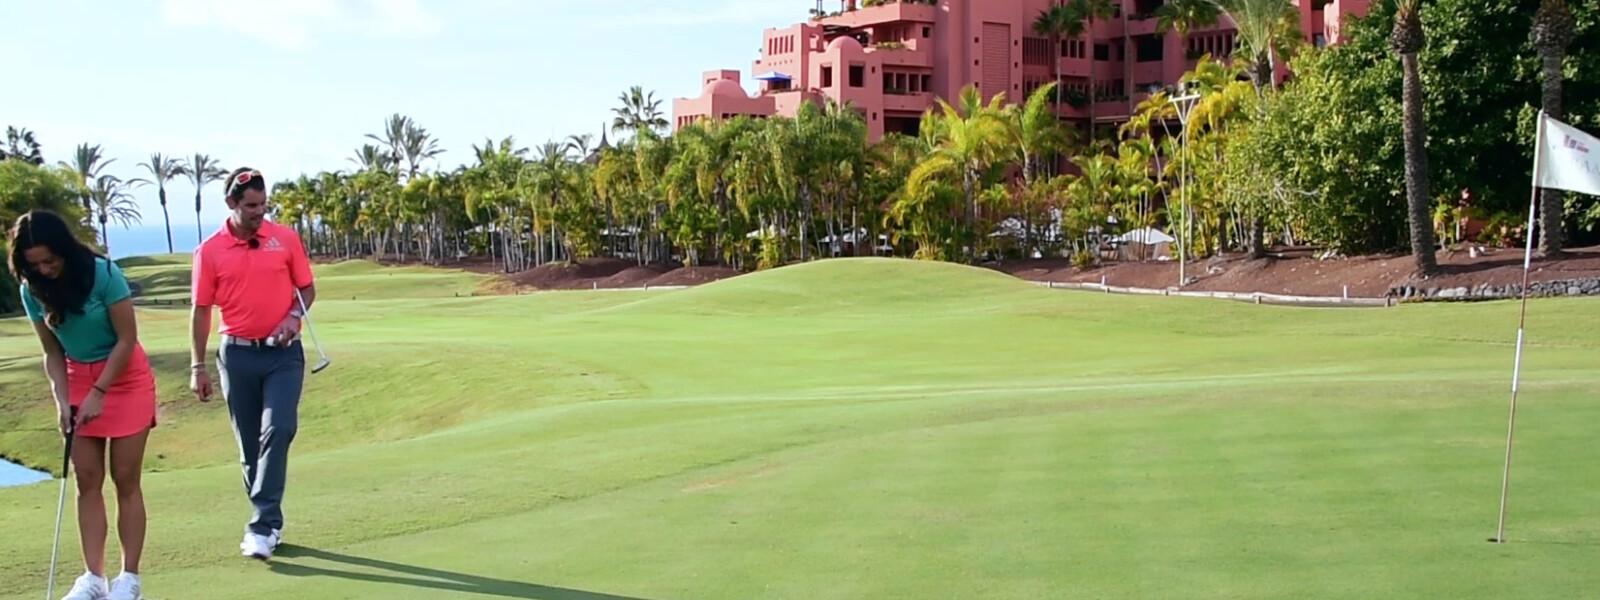 6. Golf-Trainingsvideo: Grün lesen